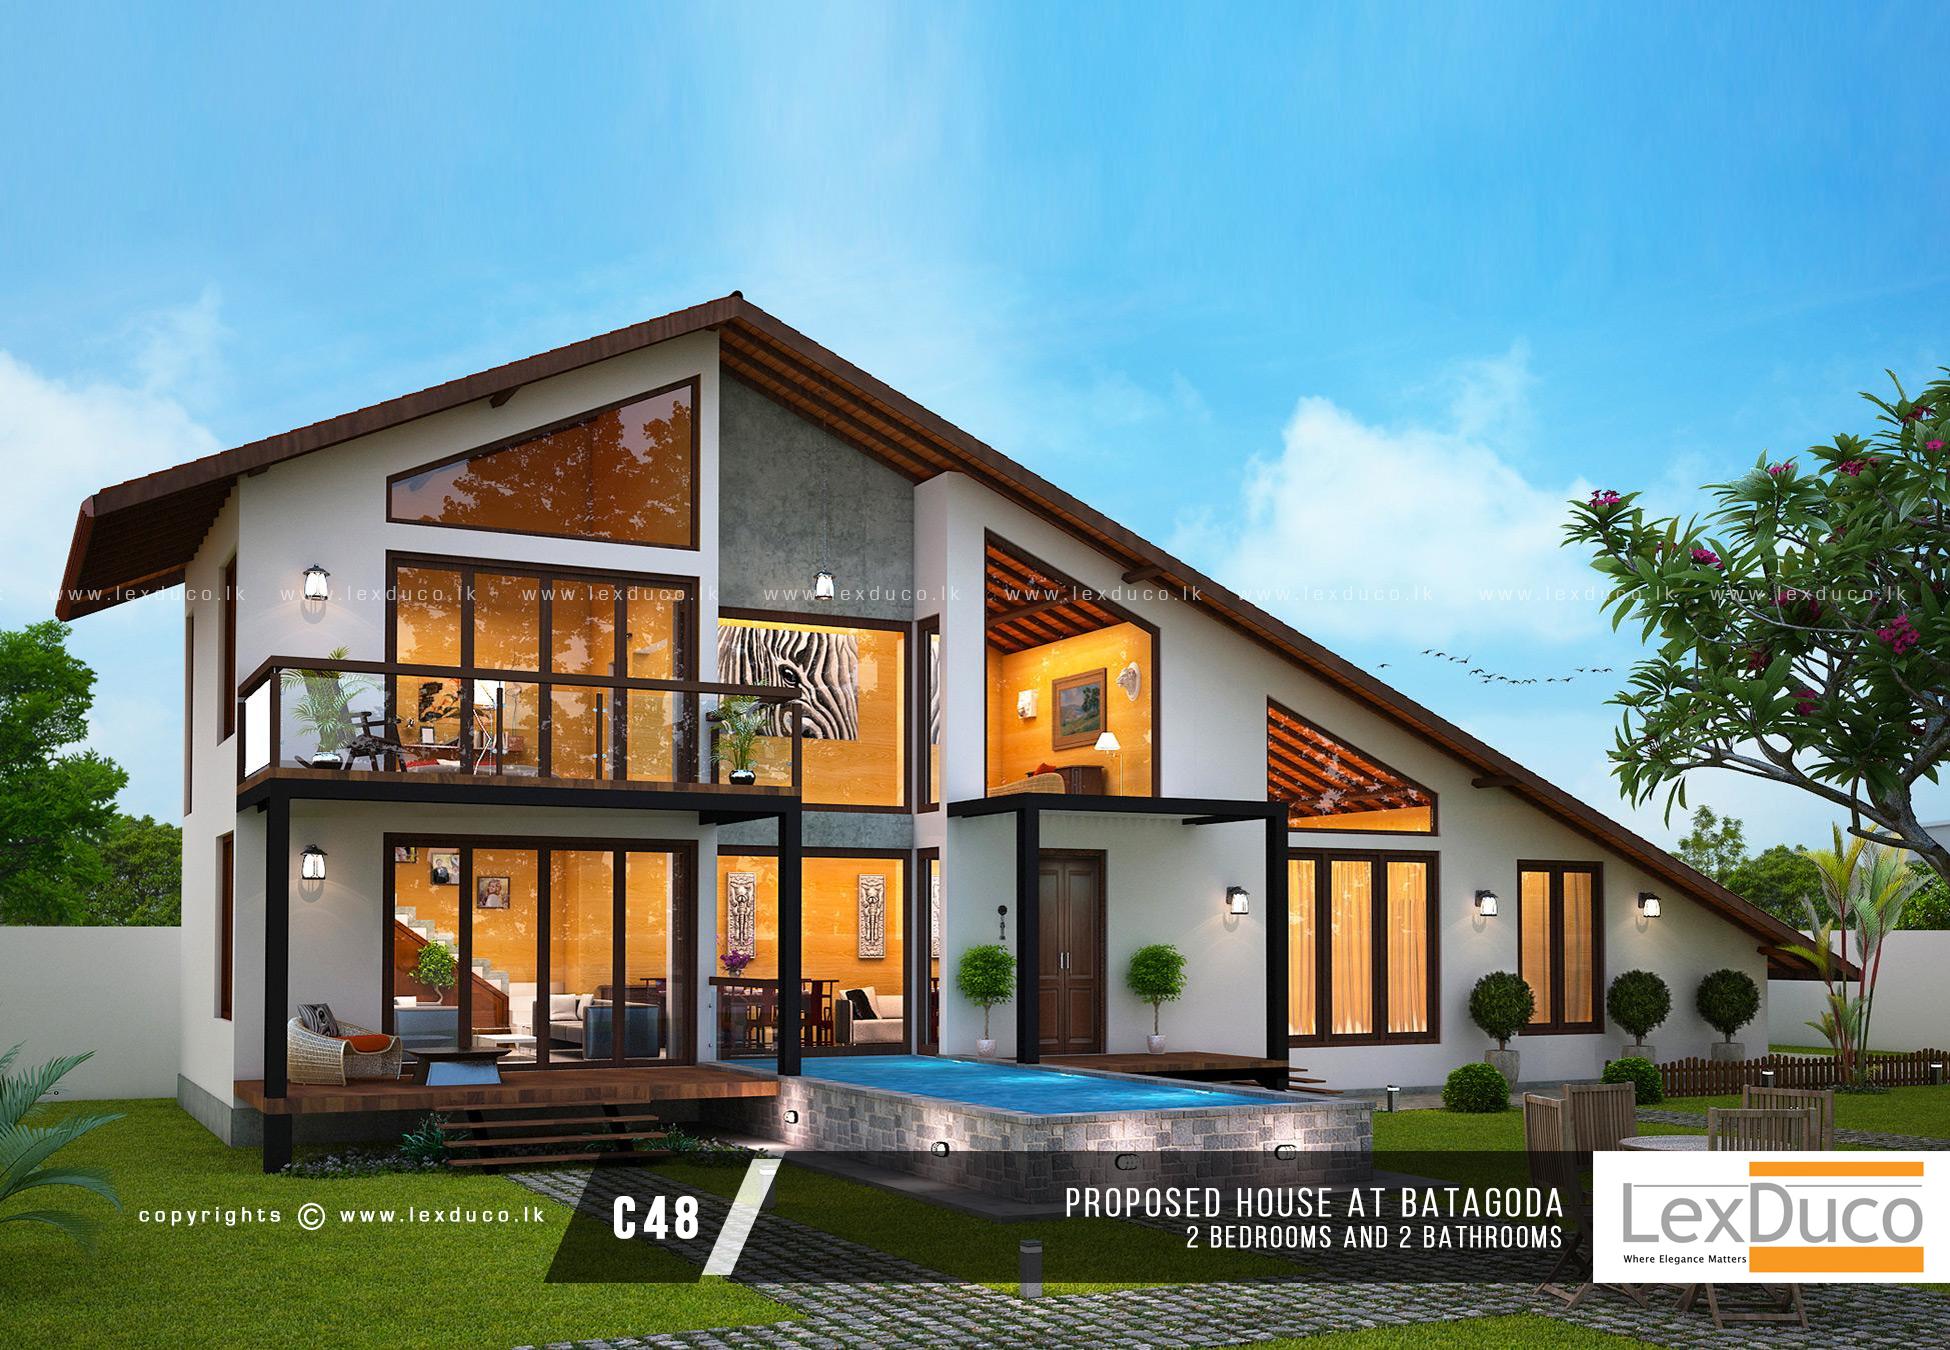 1 House Builders In Sri Lanka Home Design amp Build Company Lex Duco